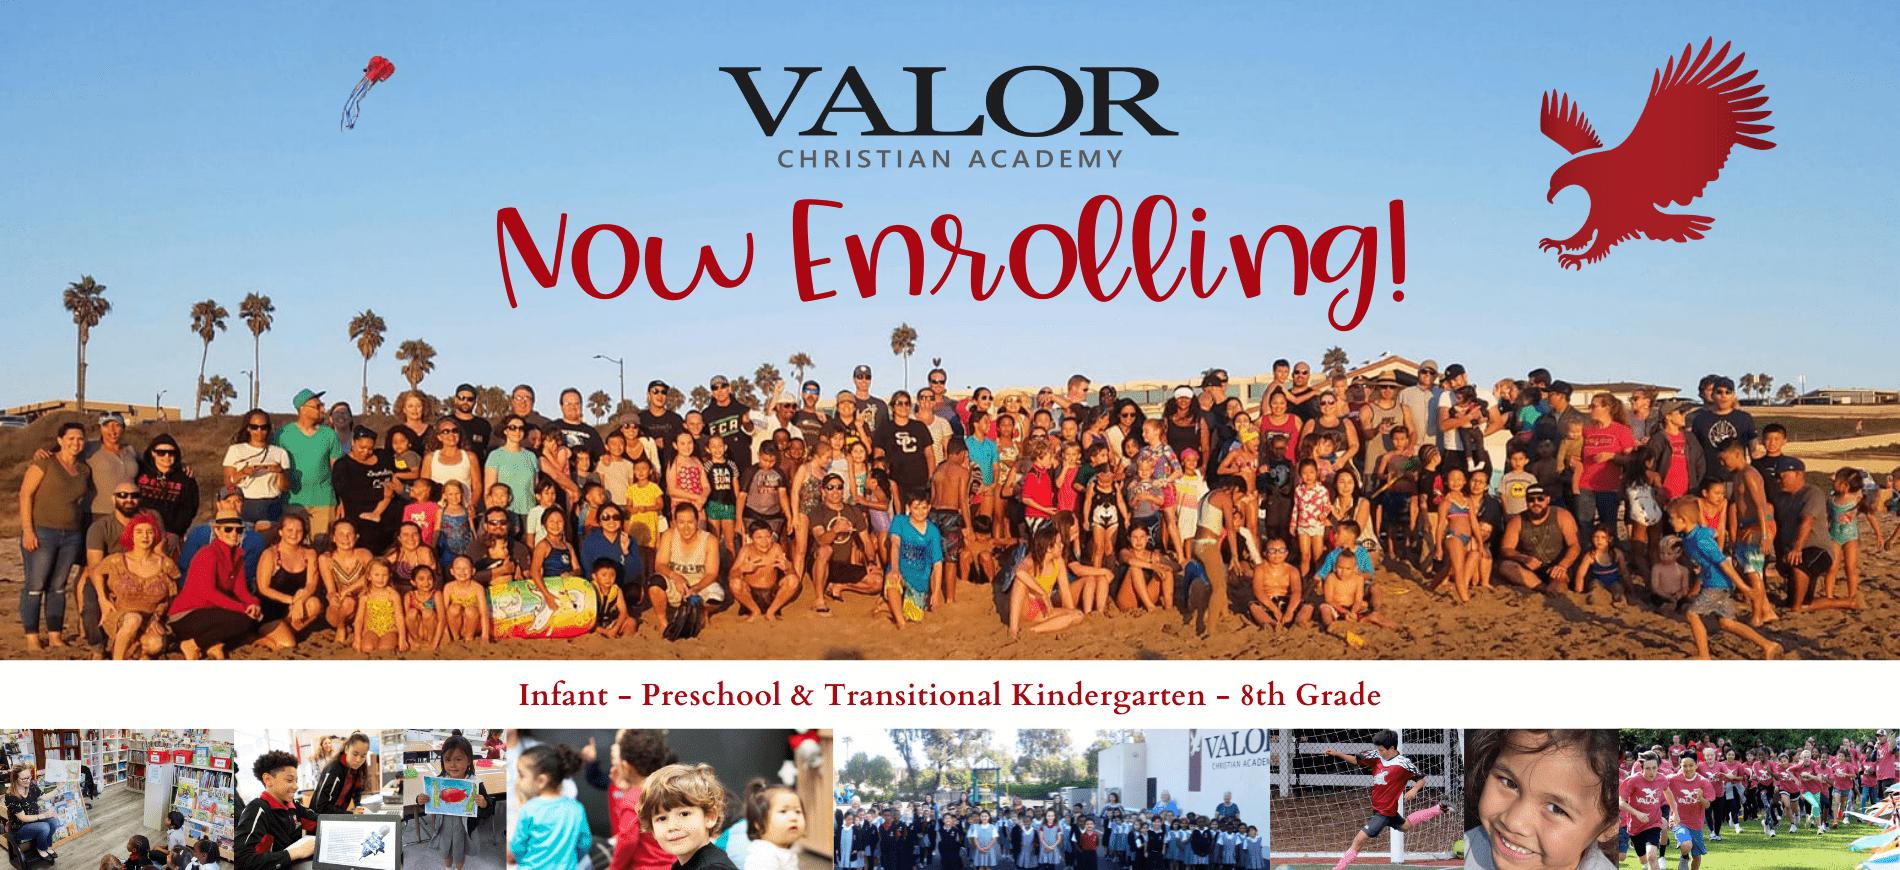 Valor Christian Academy - Now Enrolling for Infants through Preschool and Transitional Kindergarten through 8th Grade